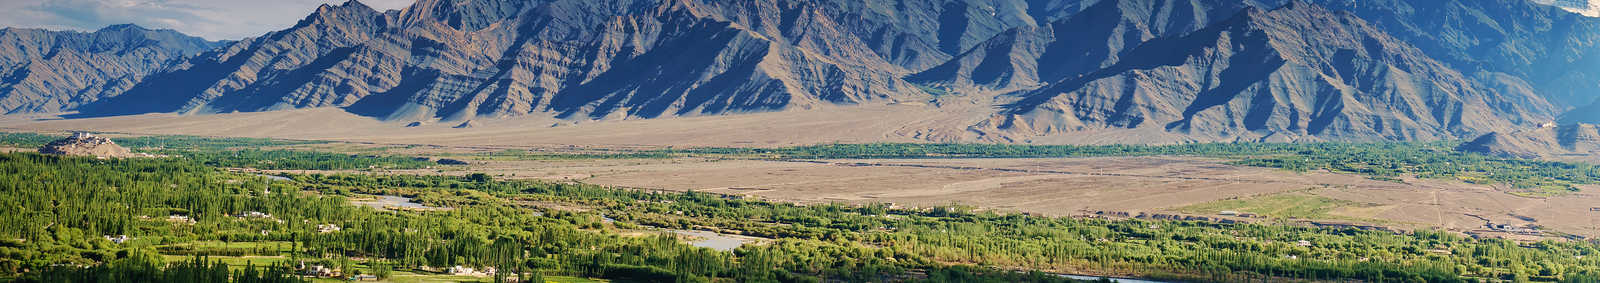 Karakoram Mountains, Pakistan